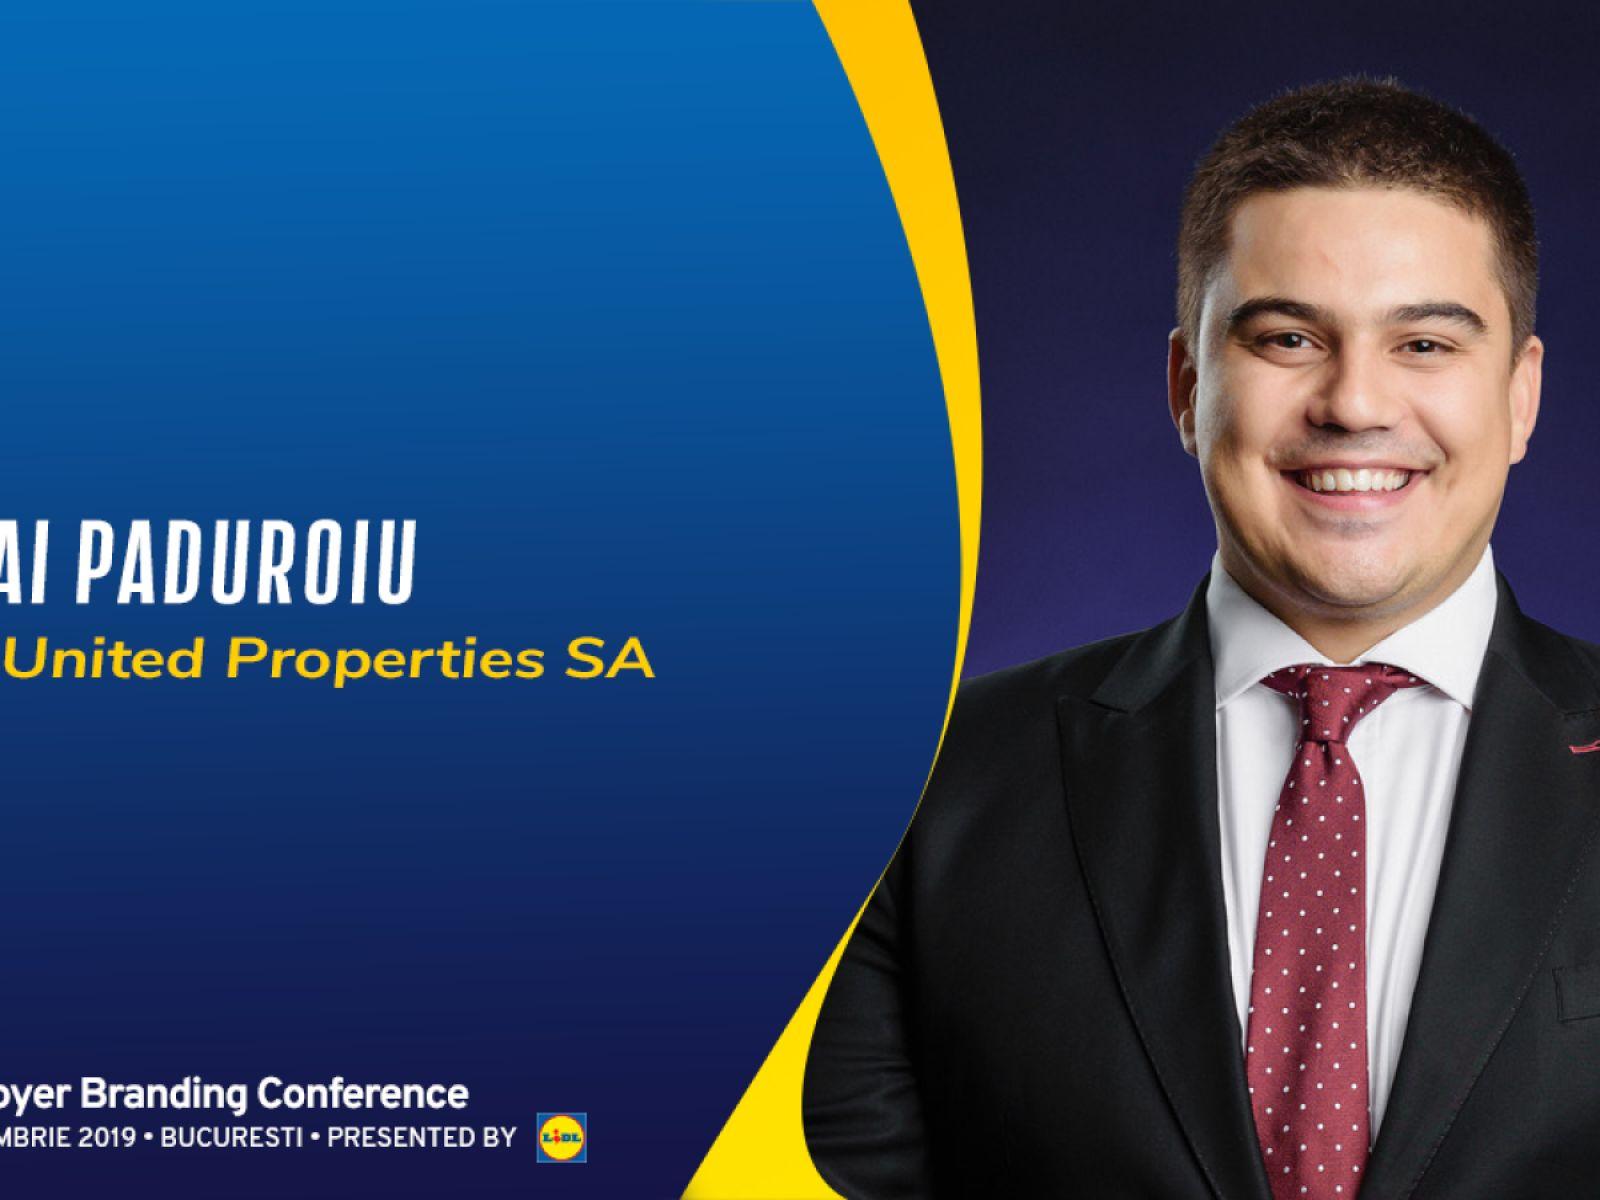 Mihai Păduroiu, CEO Office Division, speaker at Employer Branding Conference